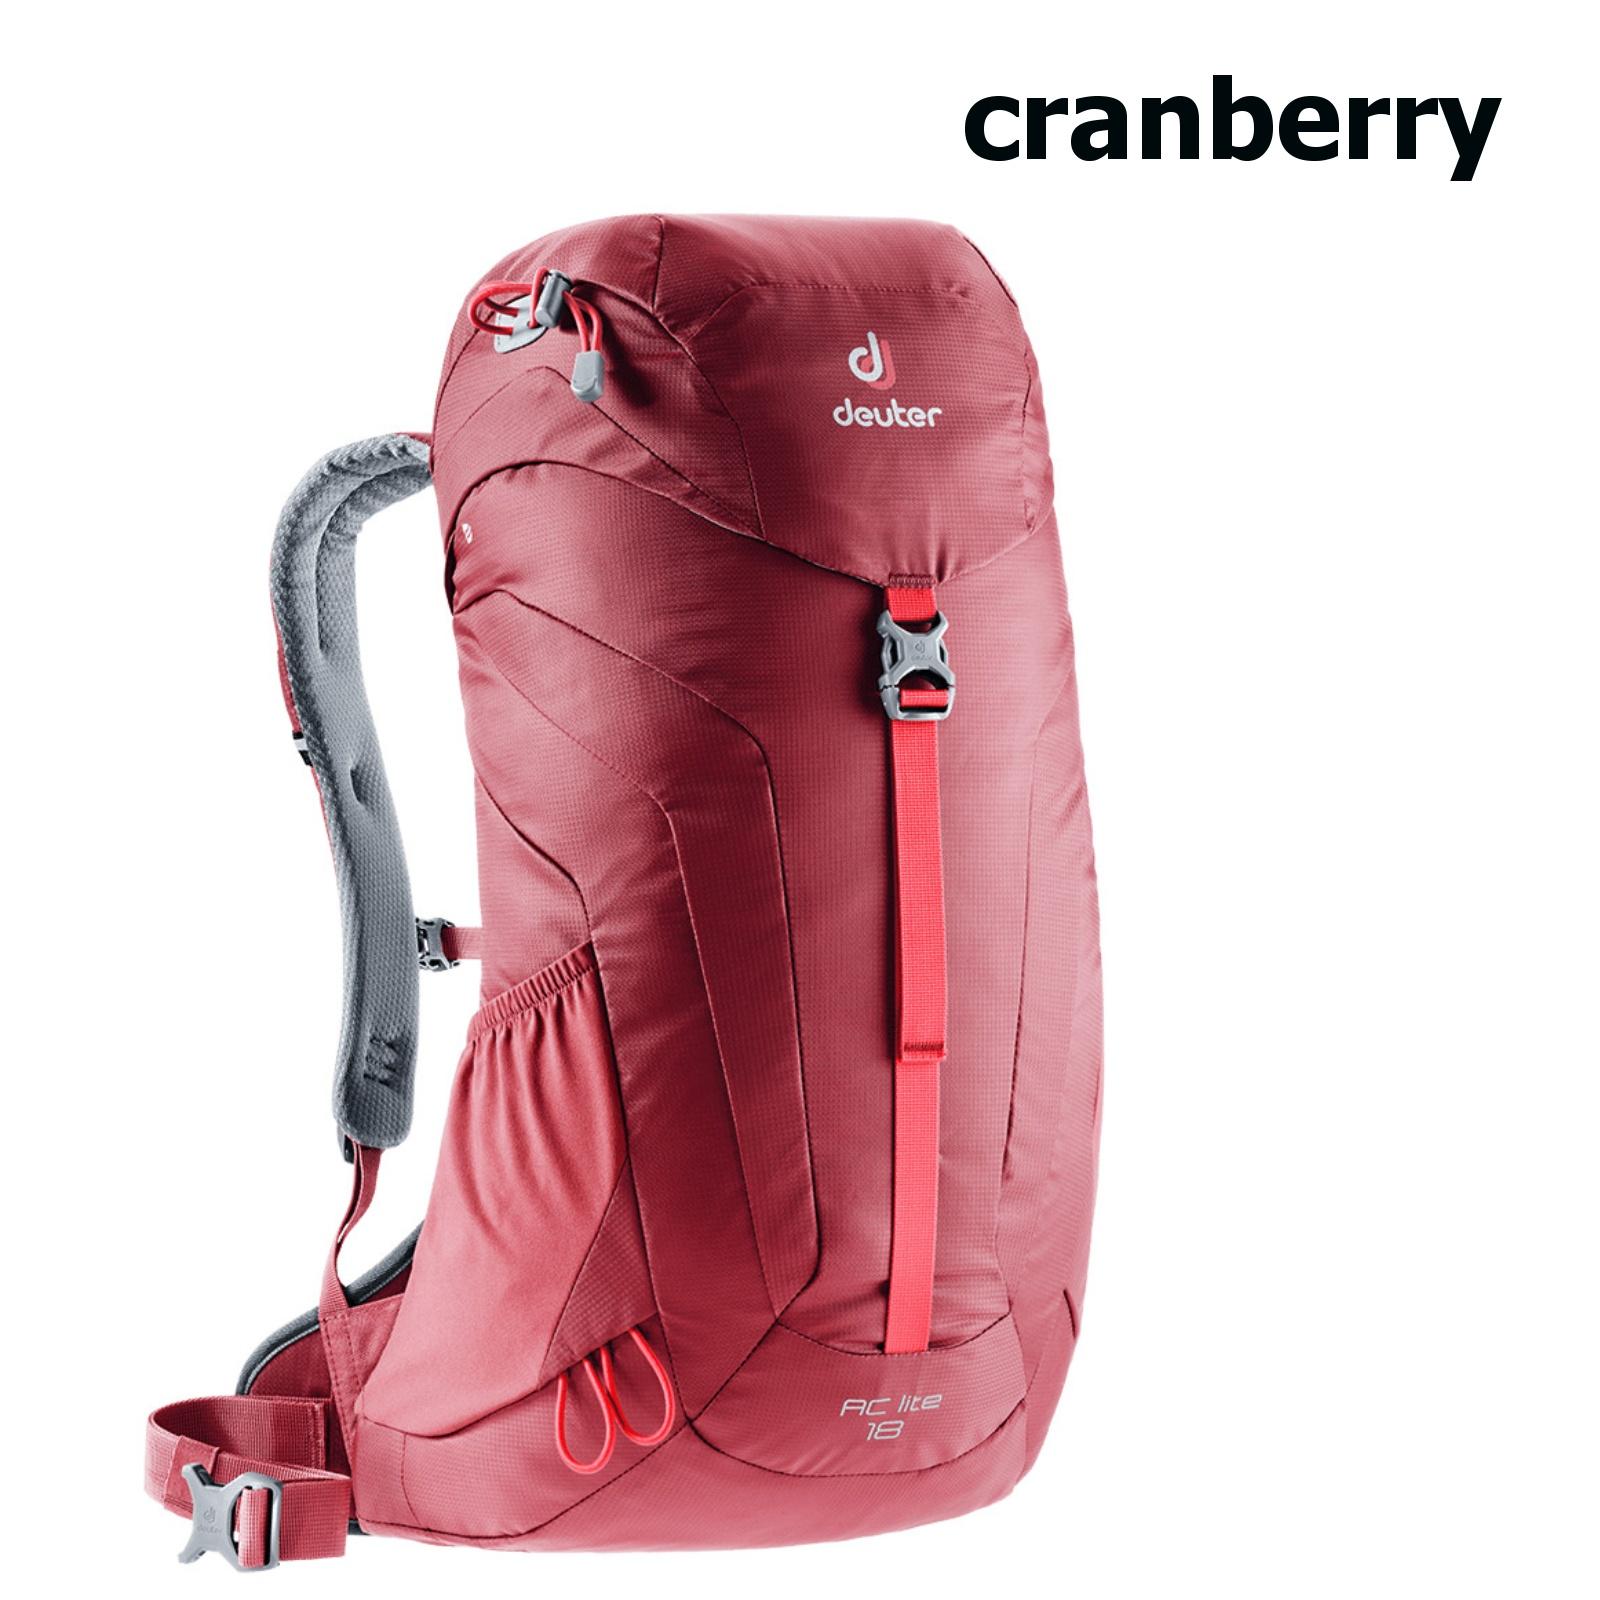 Deuter AC Lite 18 cranberry